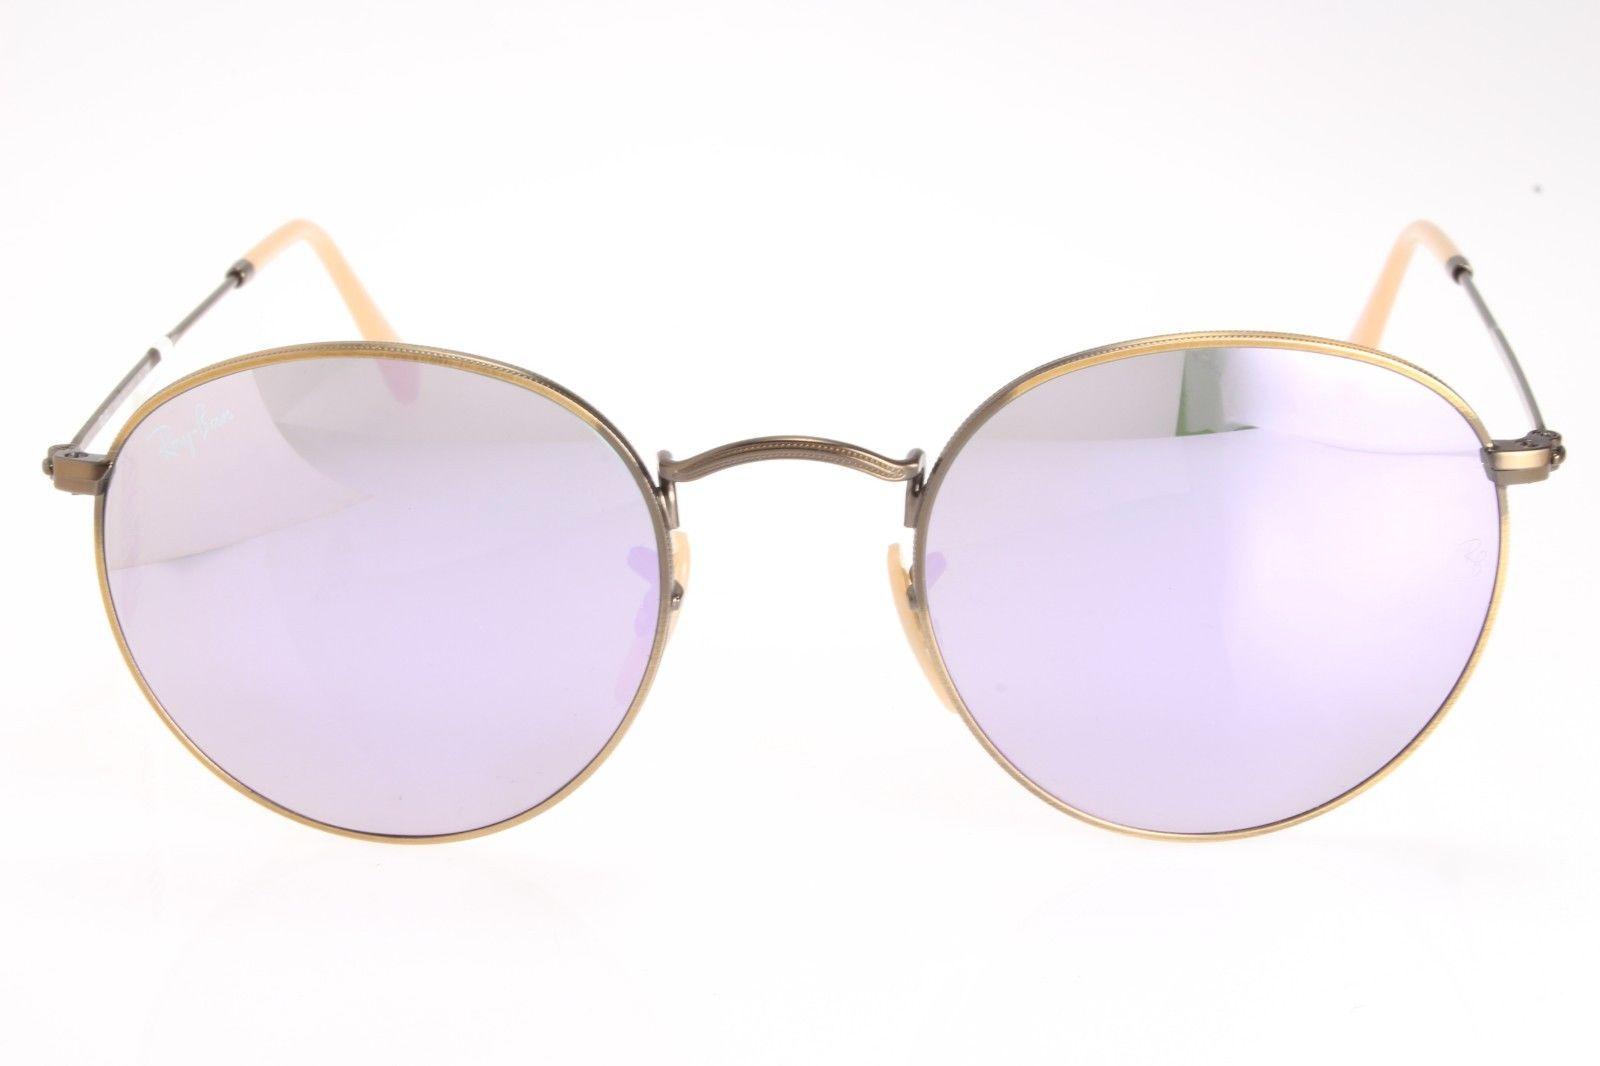 967d13f934f New original sunglasses Ray Ban RB 3447 167 4K 50 Round Bronze Lilac  mirrored